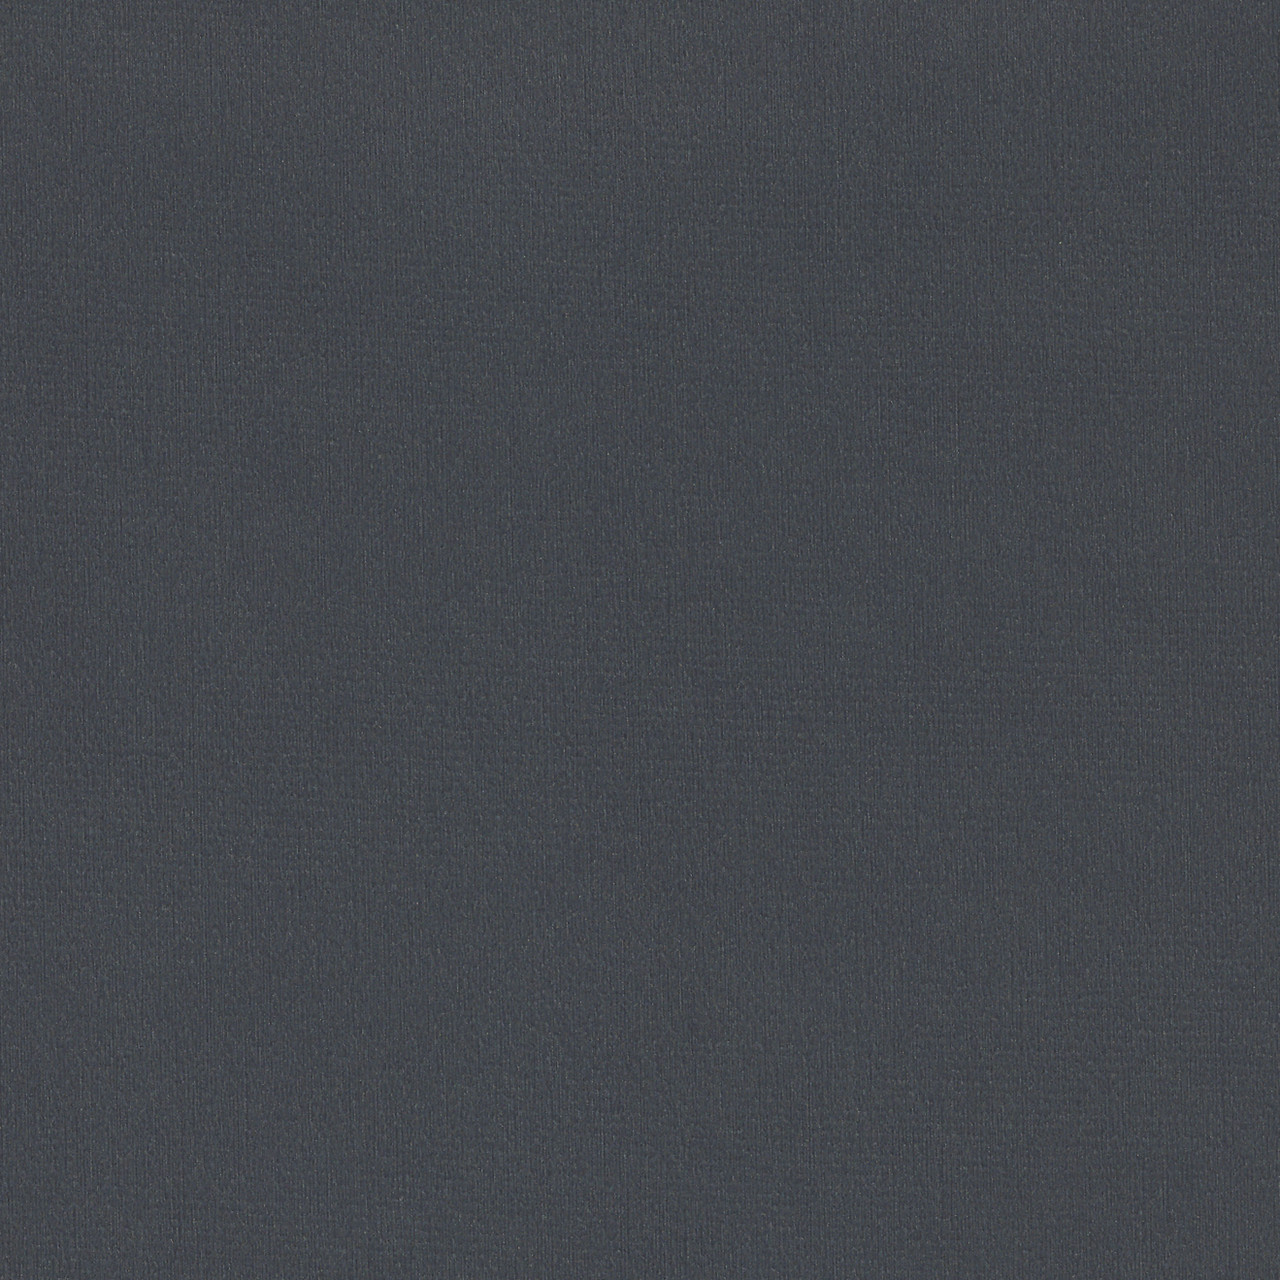 Reflex REF-7818 Charcoal